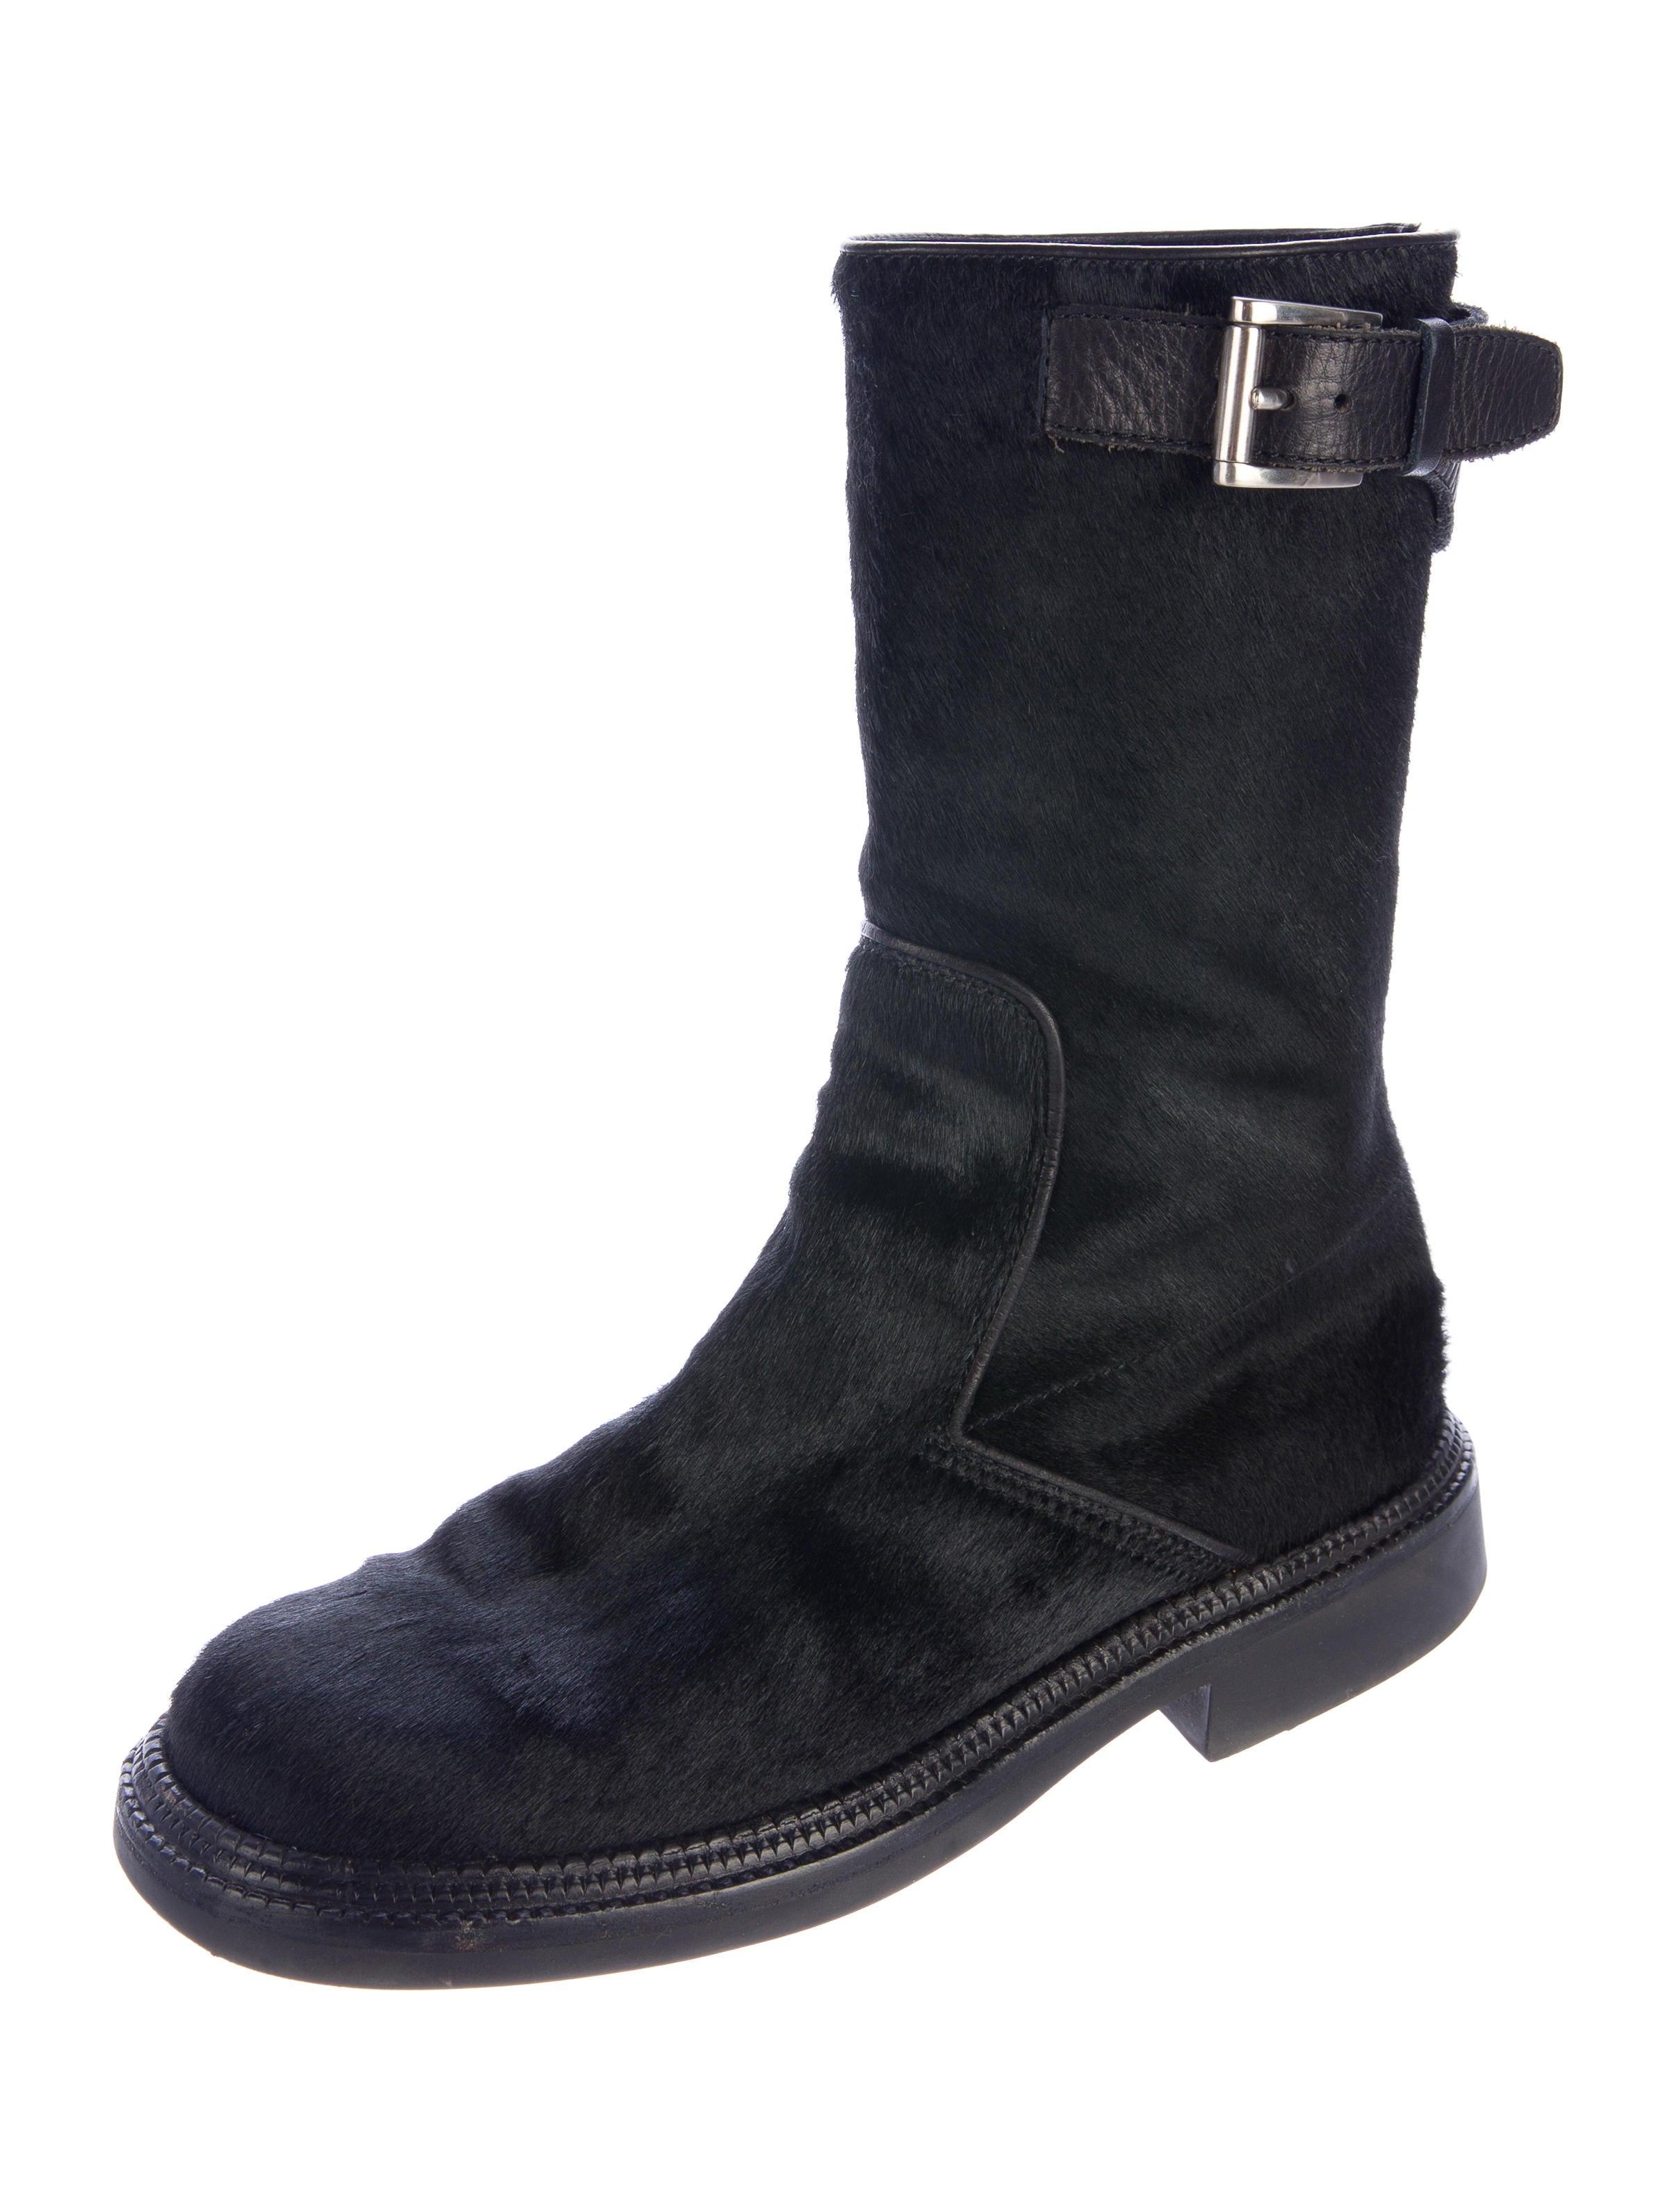 Prada Sport Ponyhair Mid-Calf Boots pay with visa cheap price k4tG7